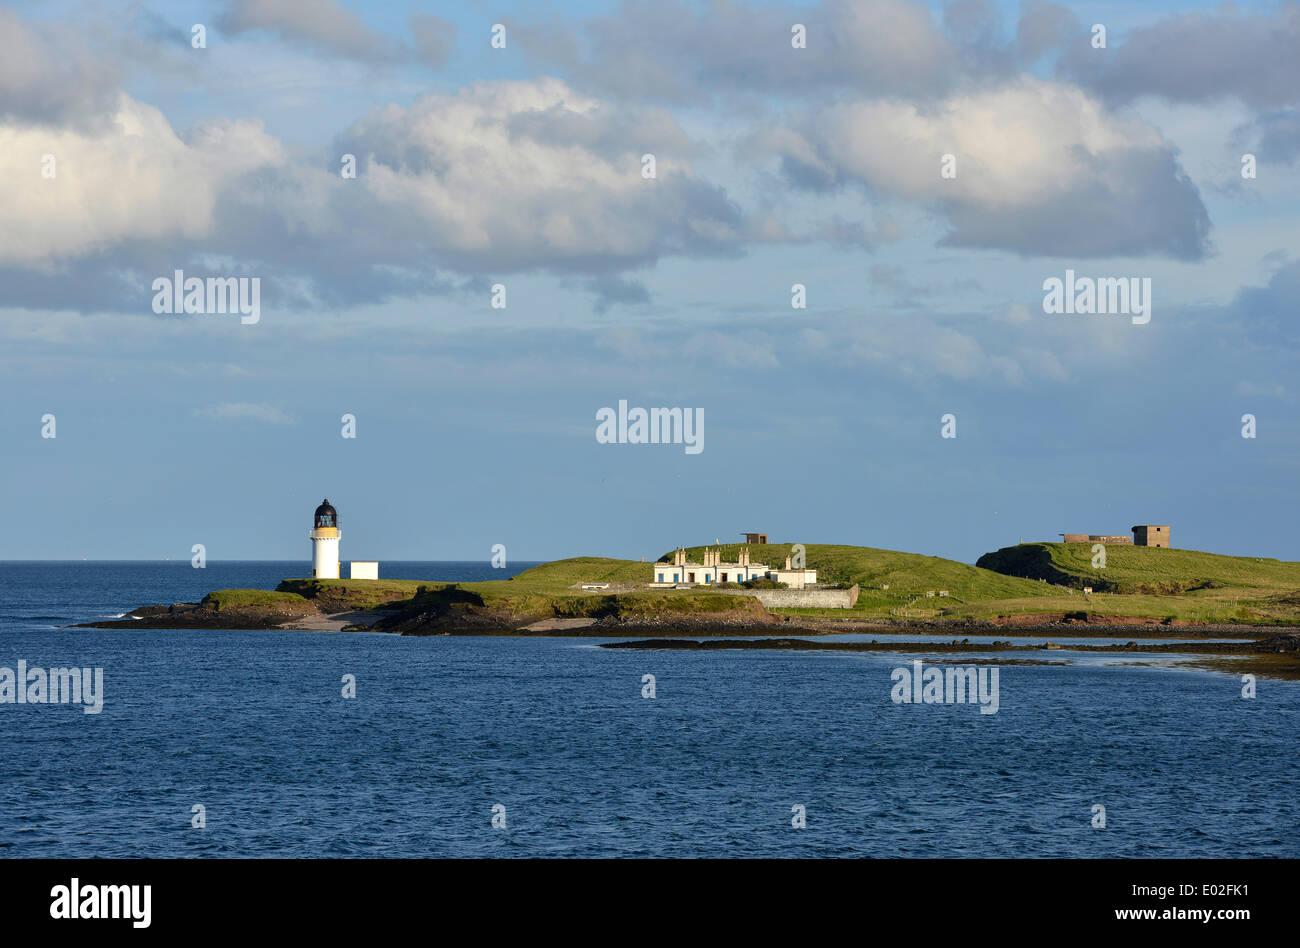 Lighthouse at the harbor entrance of Stornoway, Isle of Lewis and Harris, Outer Hebrides, Scotland, United Kingdom - Stock Image